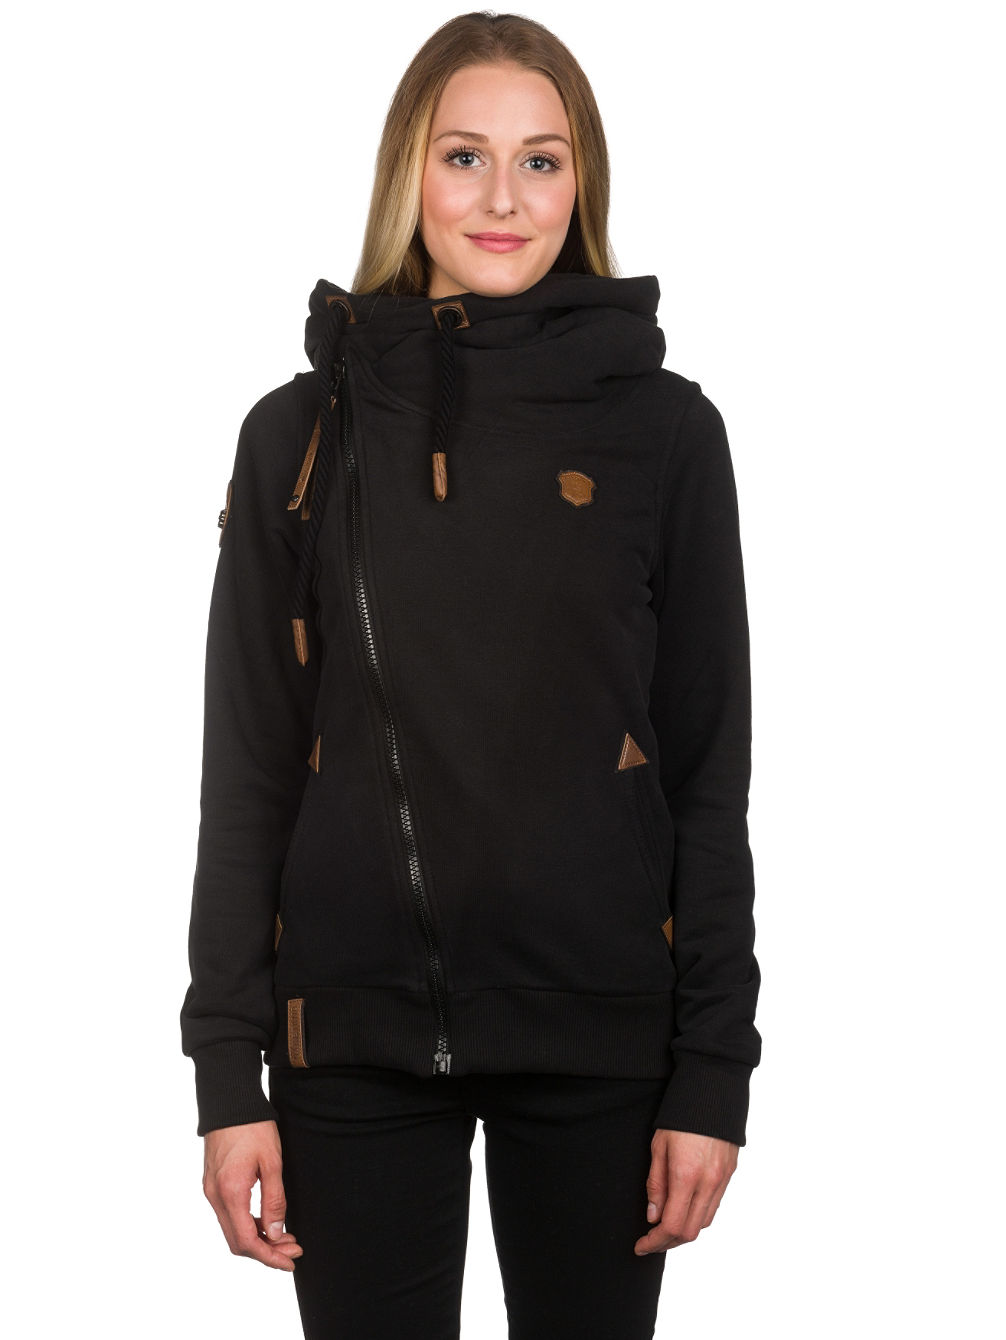 family-biz-vi-zip-hoodie